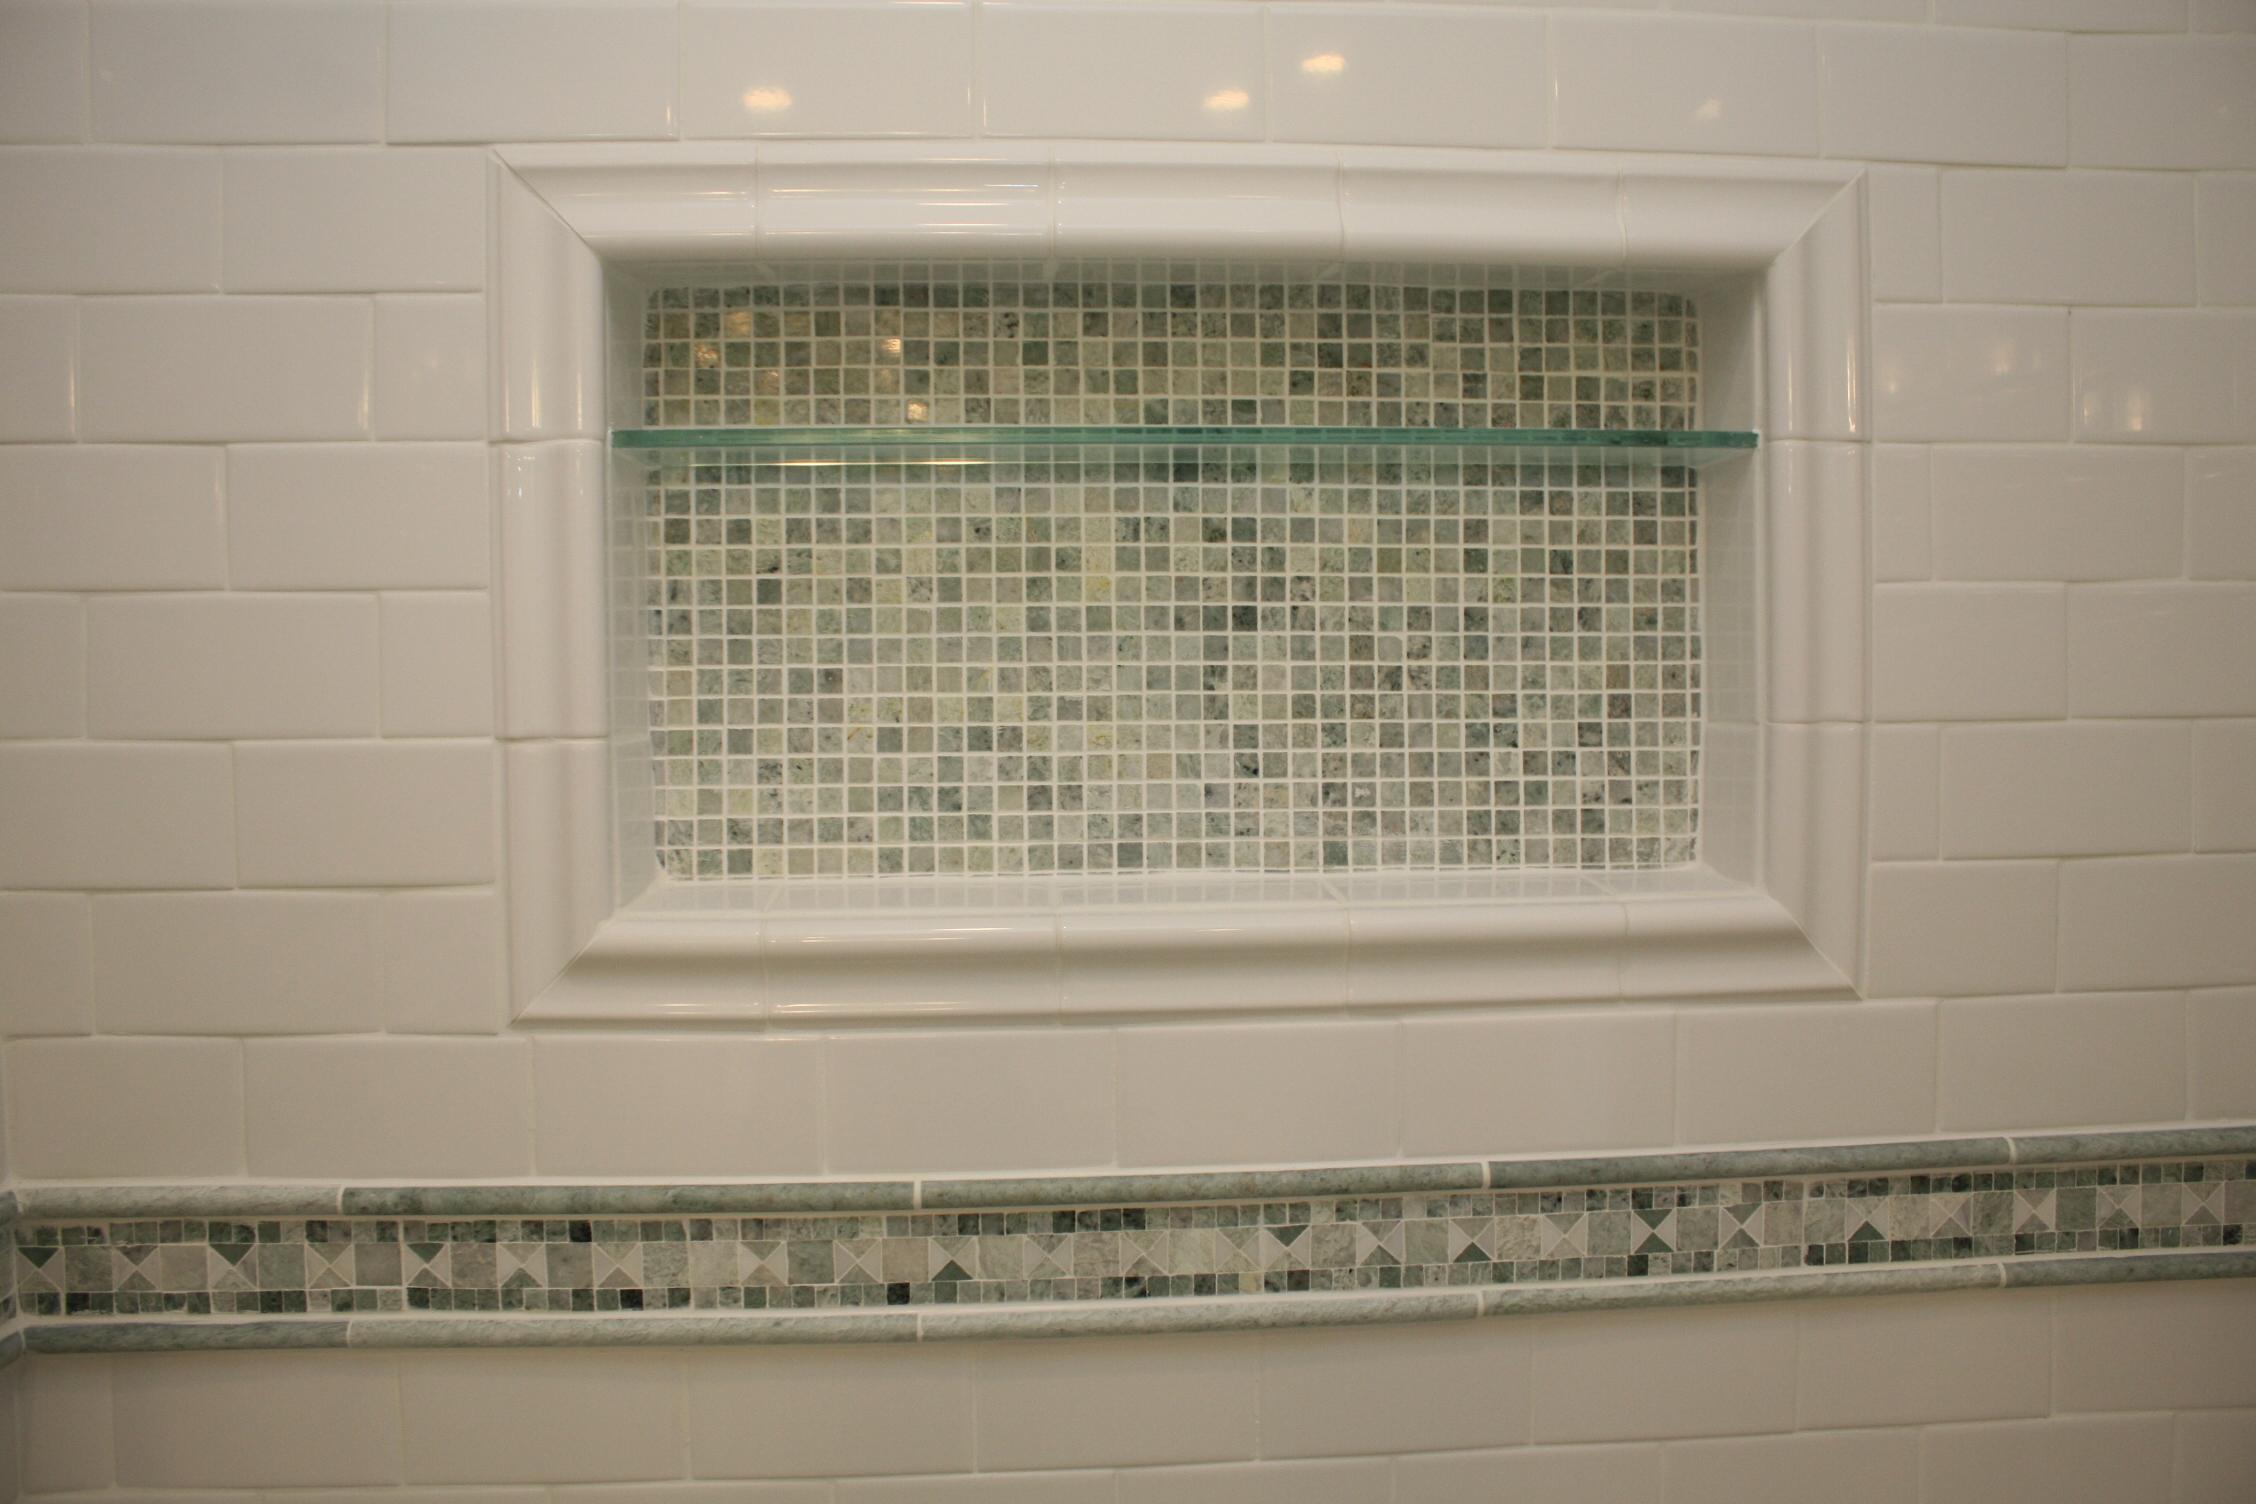 cvisions_bathroom_remodel15.JPG